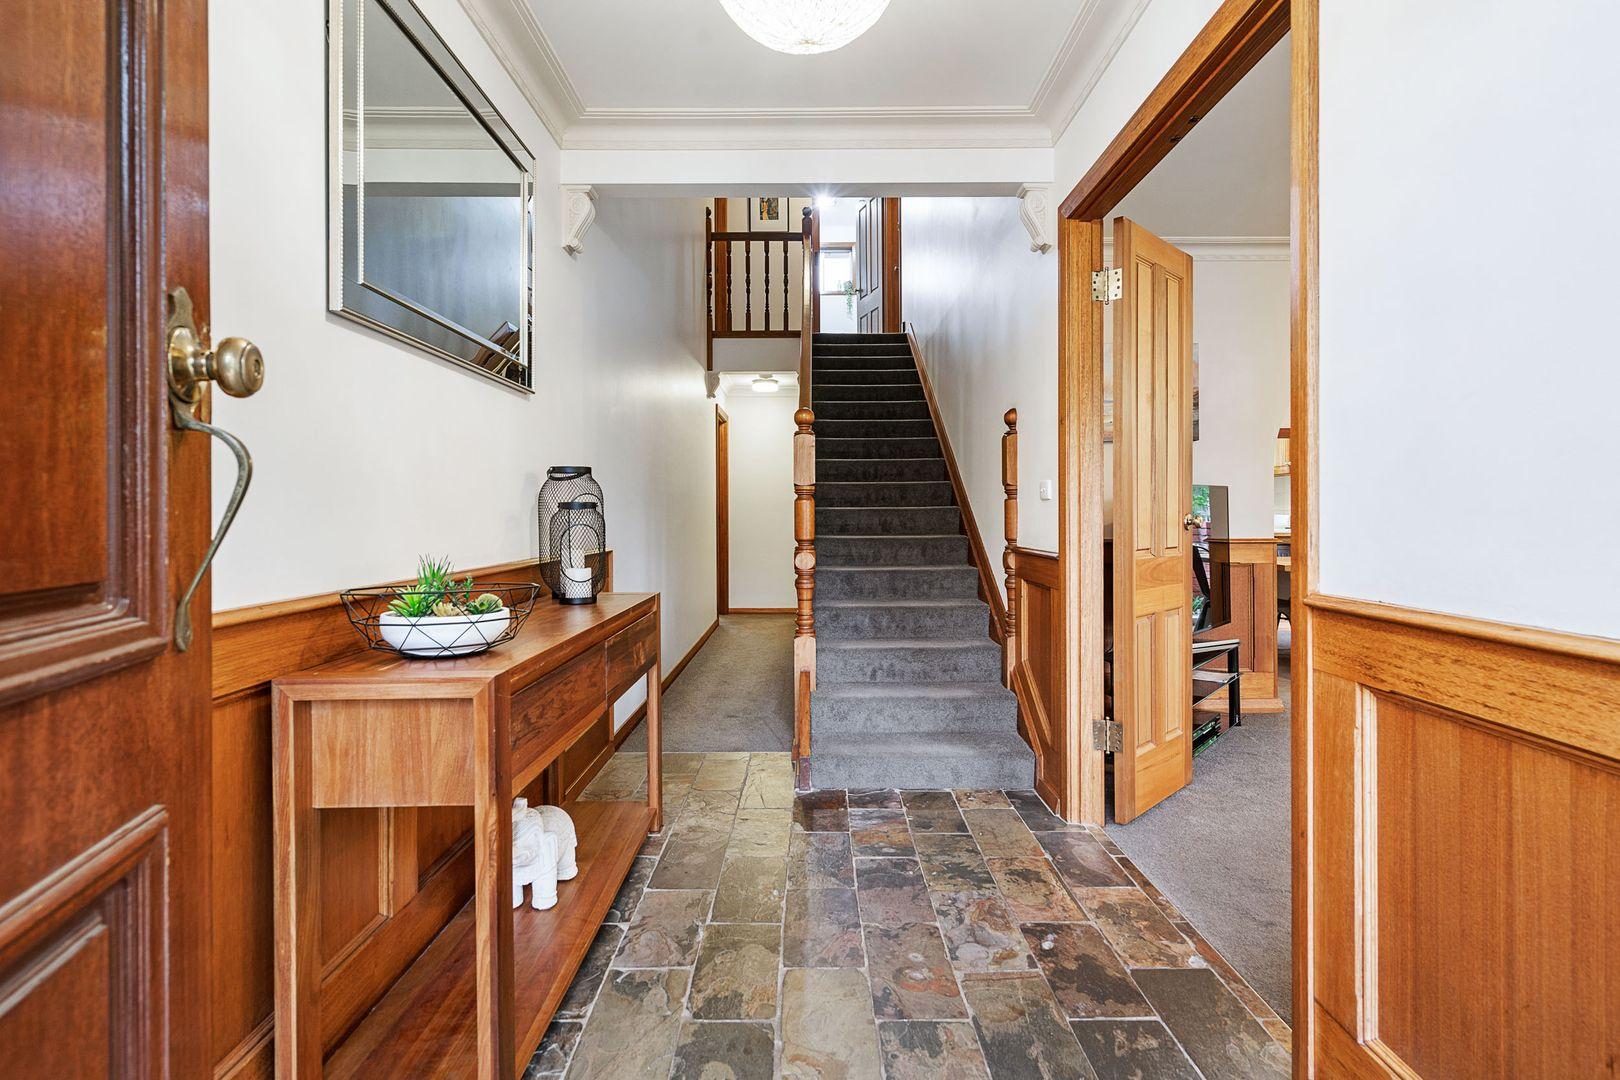 2/537 Kiewa Place, Albury NSW 2640, Image 2